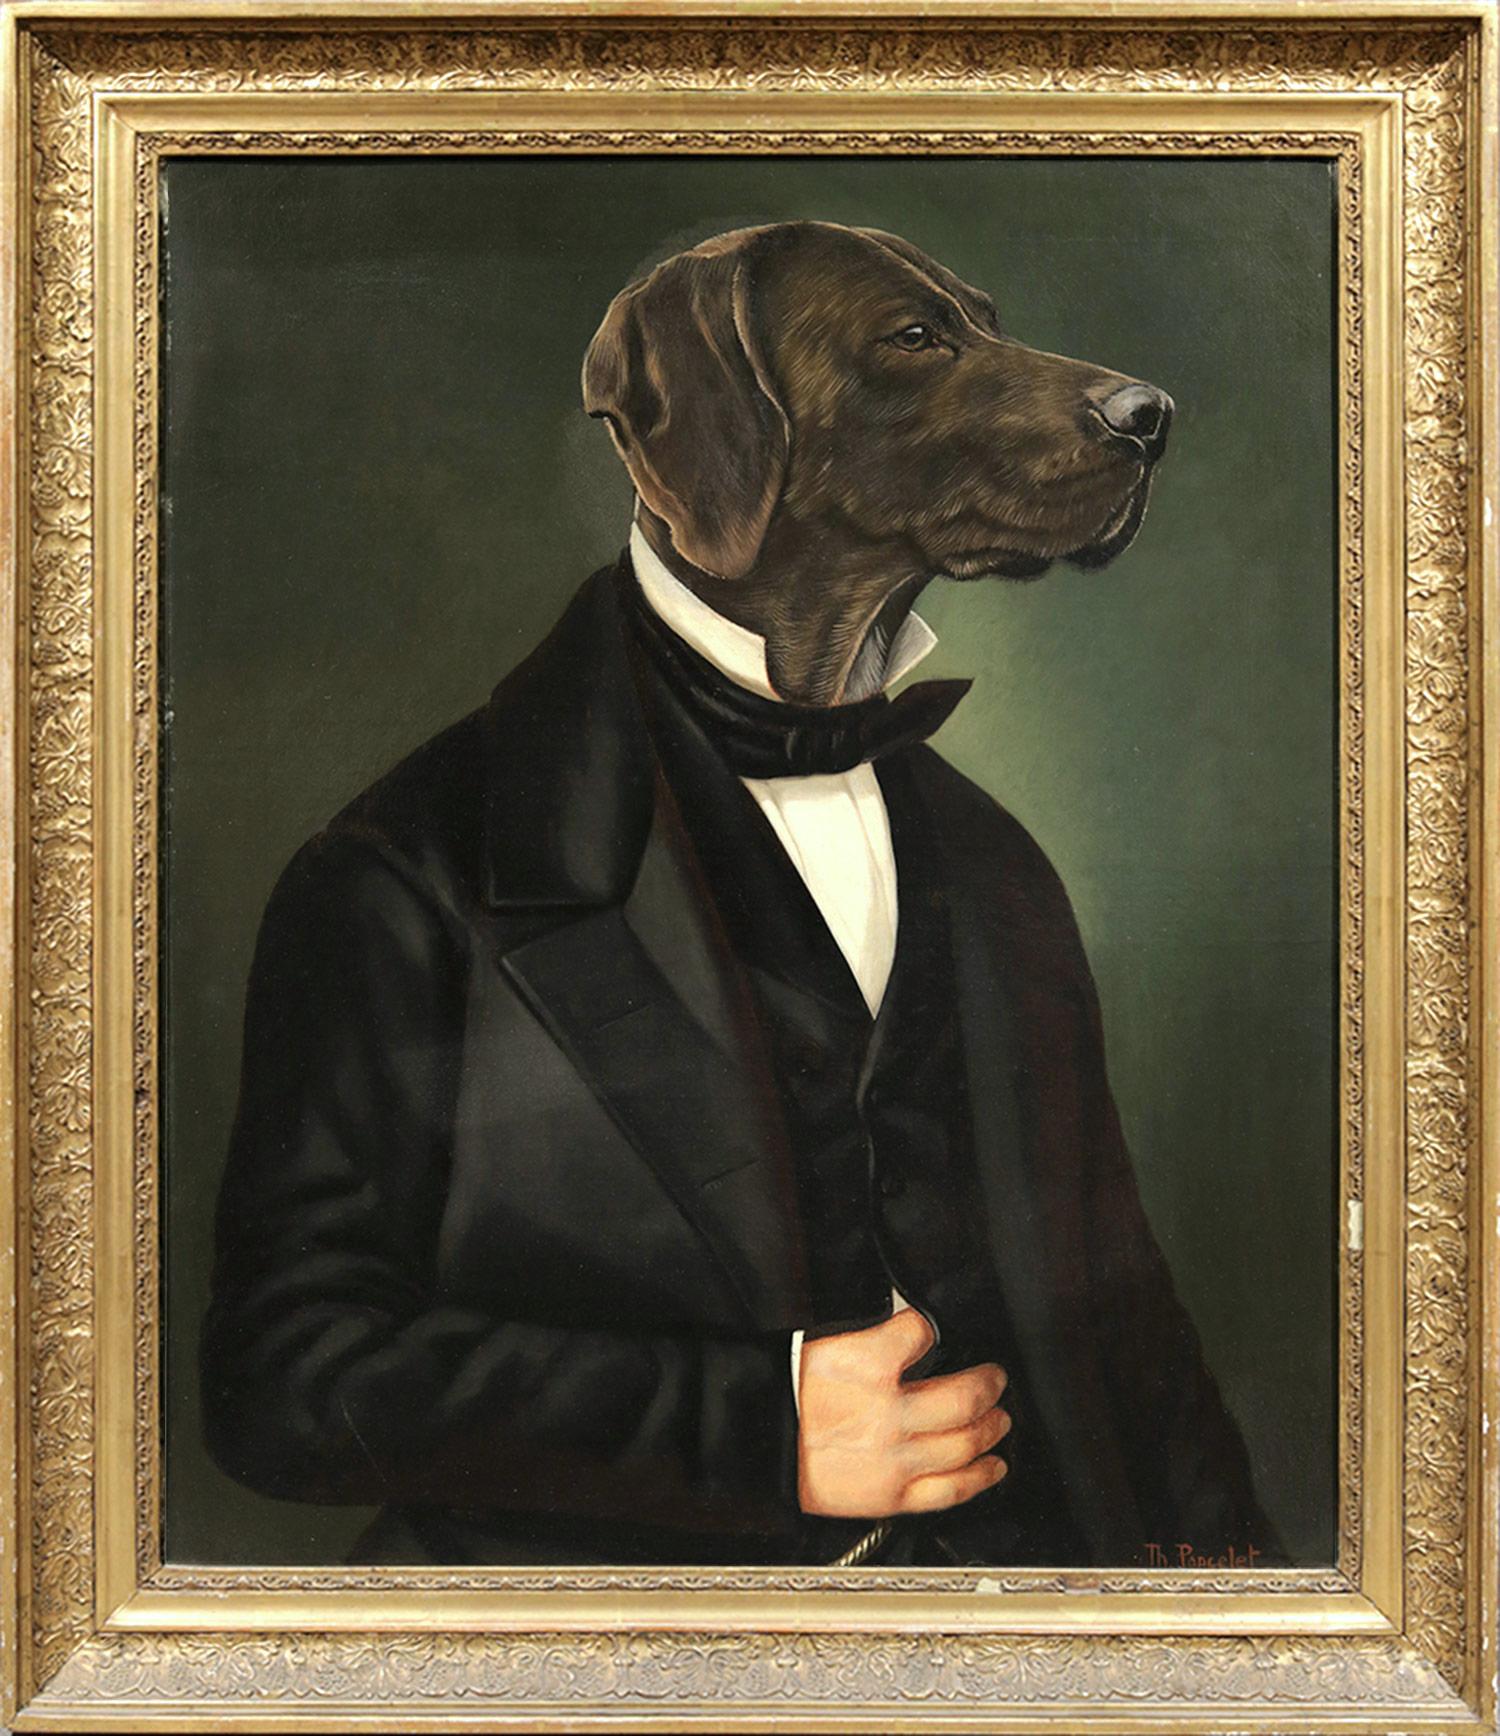 The Gentleman Labrador, 20th Century